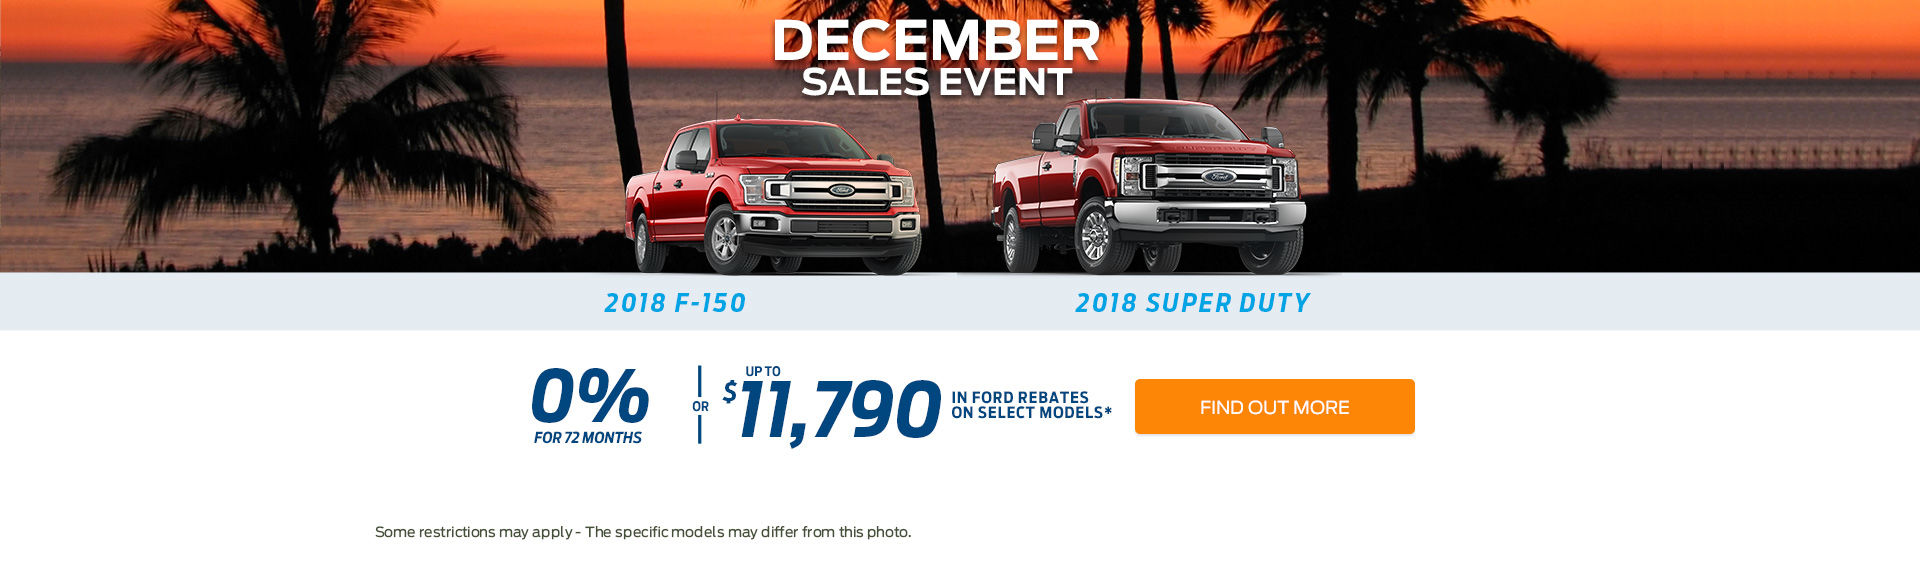 December sales event - trucks